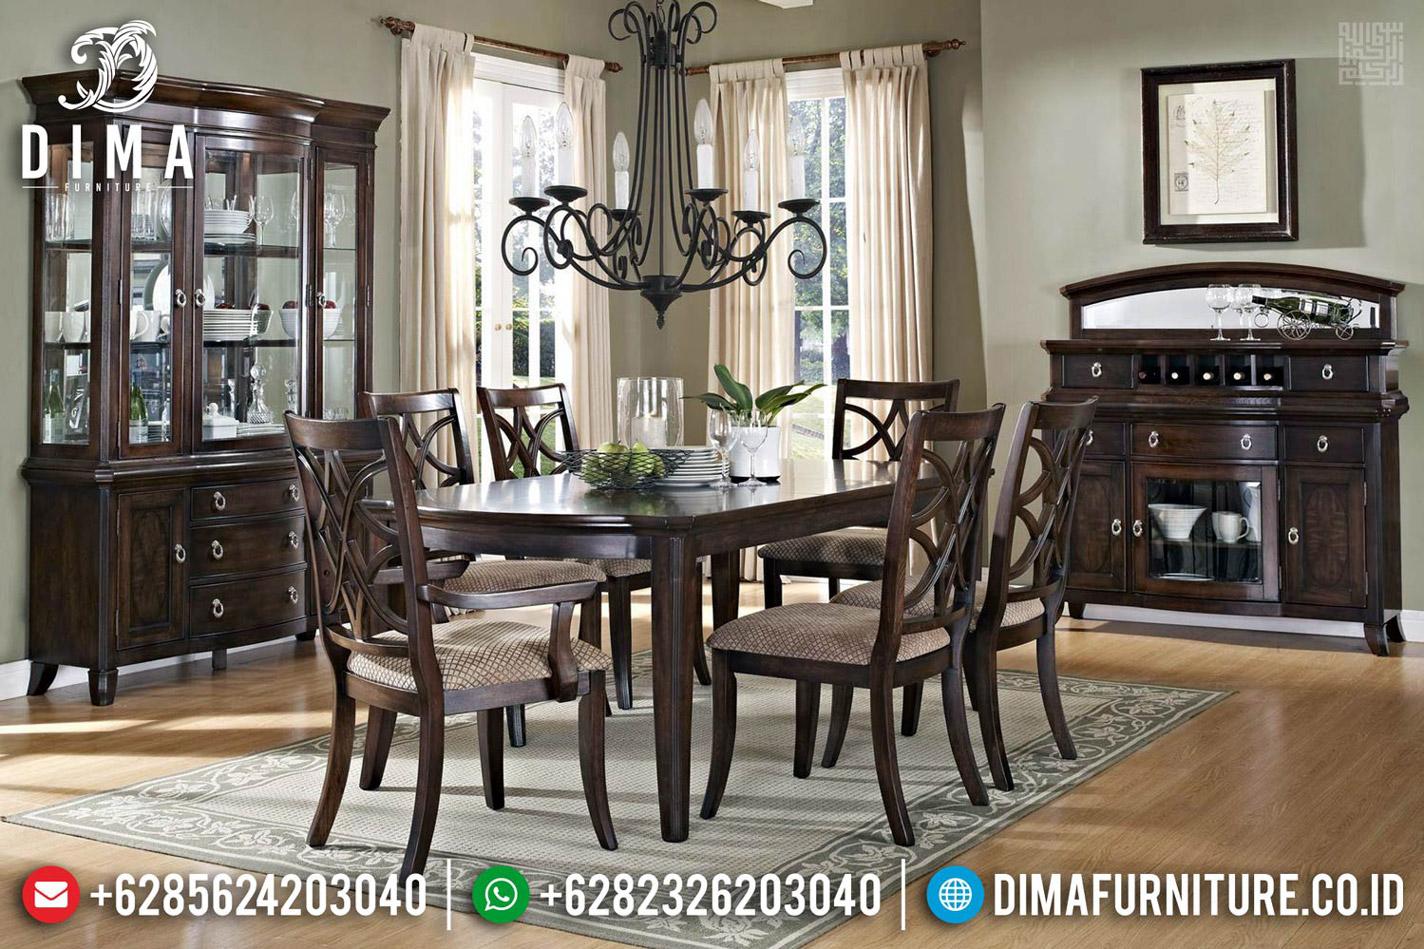 Meja Makan Jati Minimalis Kayu Perhutani Luxury Classic Salak Brown Color TTJ-0619